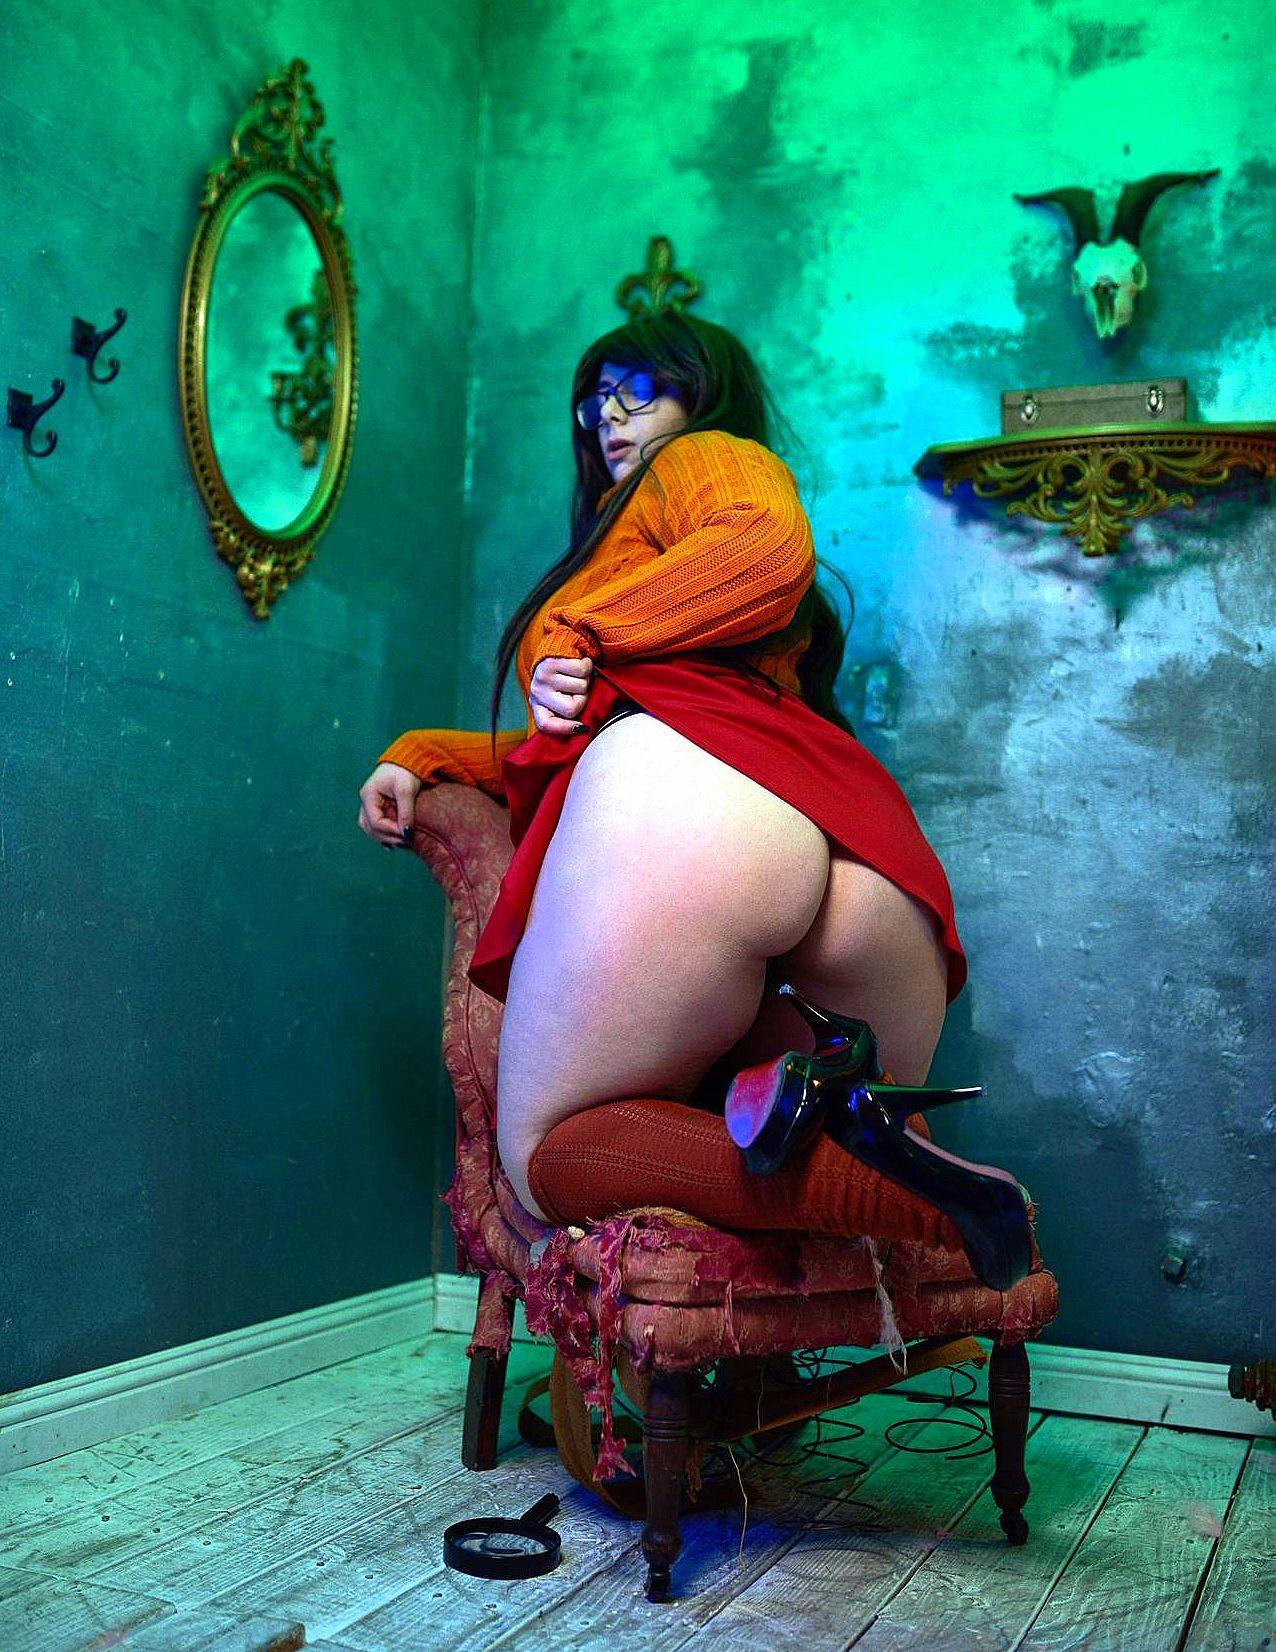 big_ass cosplay glasses high_heels scooby-doo skirt_lift stockings velma_dinkley